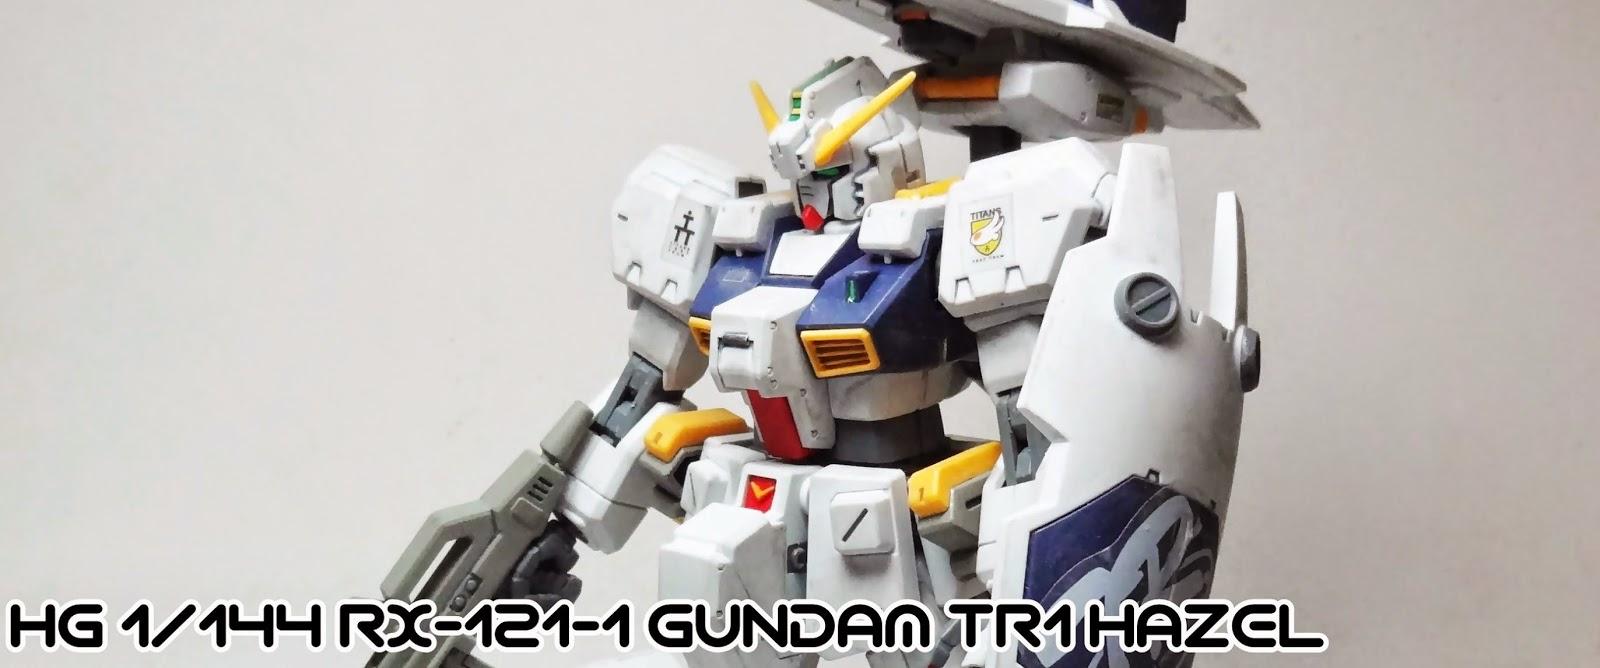 http://berryxx.blogspot.com/2014/08/review-1144-hg-rx-121-1-gundam-tr-1.html